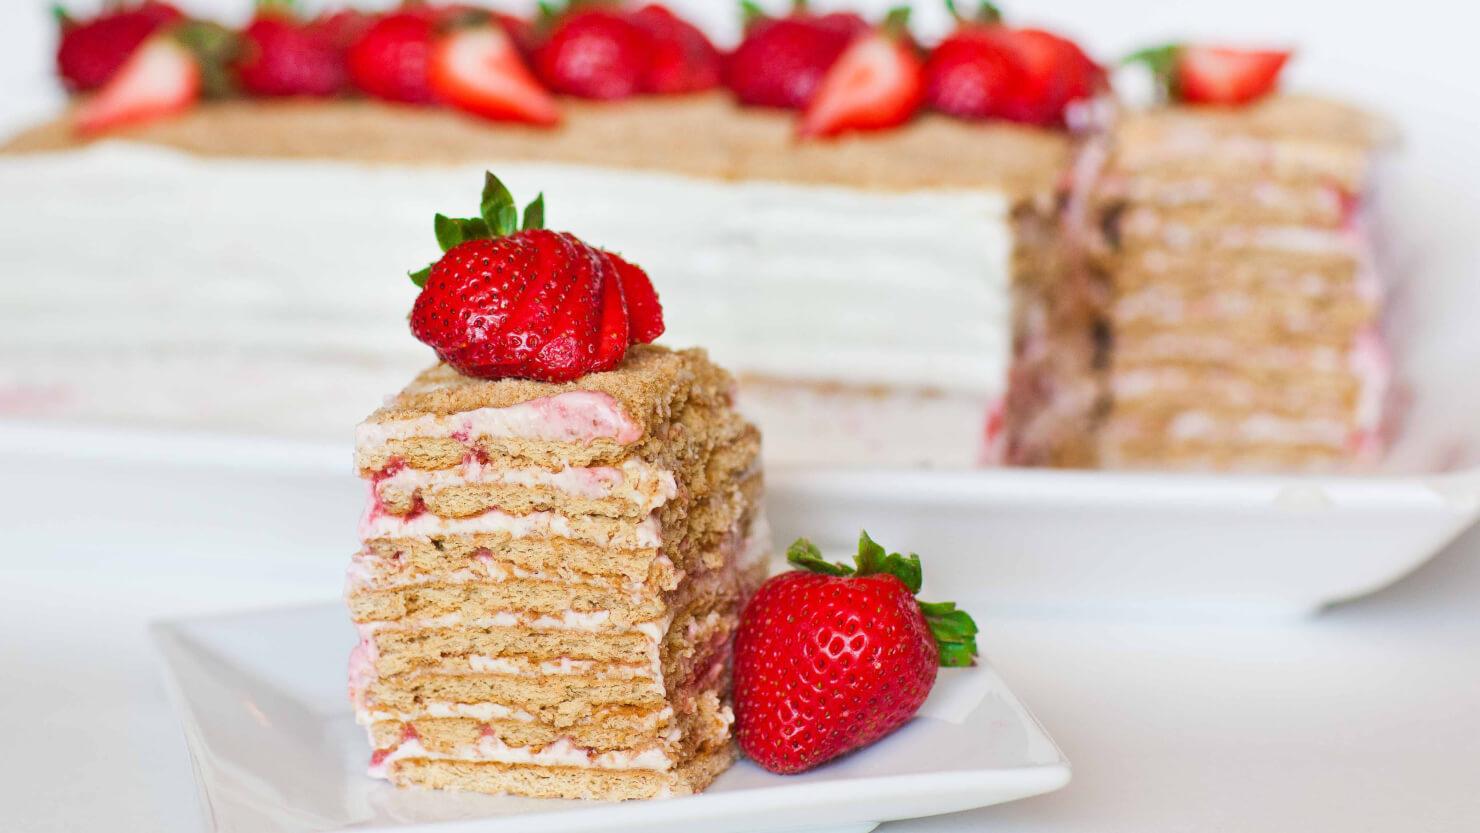 No-Bake Strawberry and Cream Cake